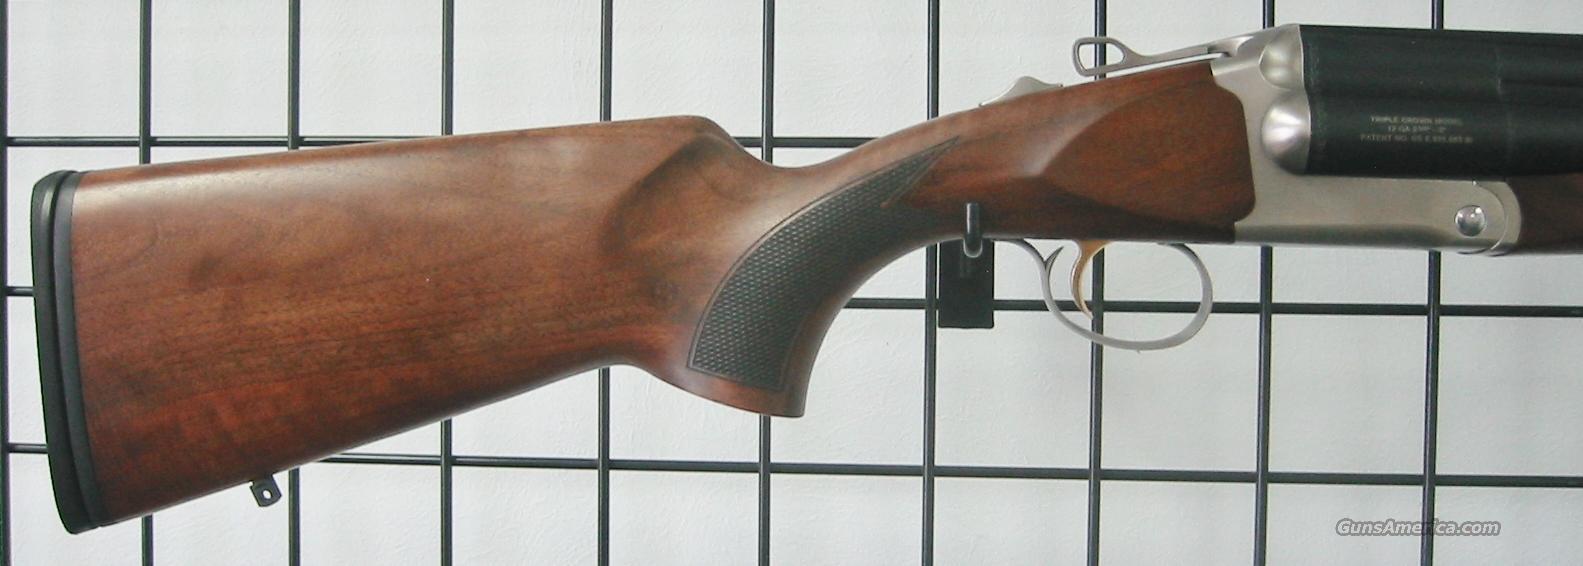 Chiappa triple crown triple barrel shotgun 12g for sale 6507346g thecheapjerseys Choice Image